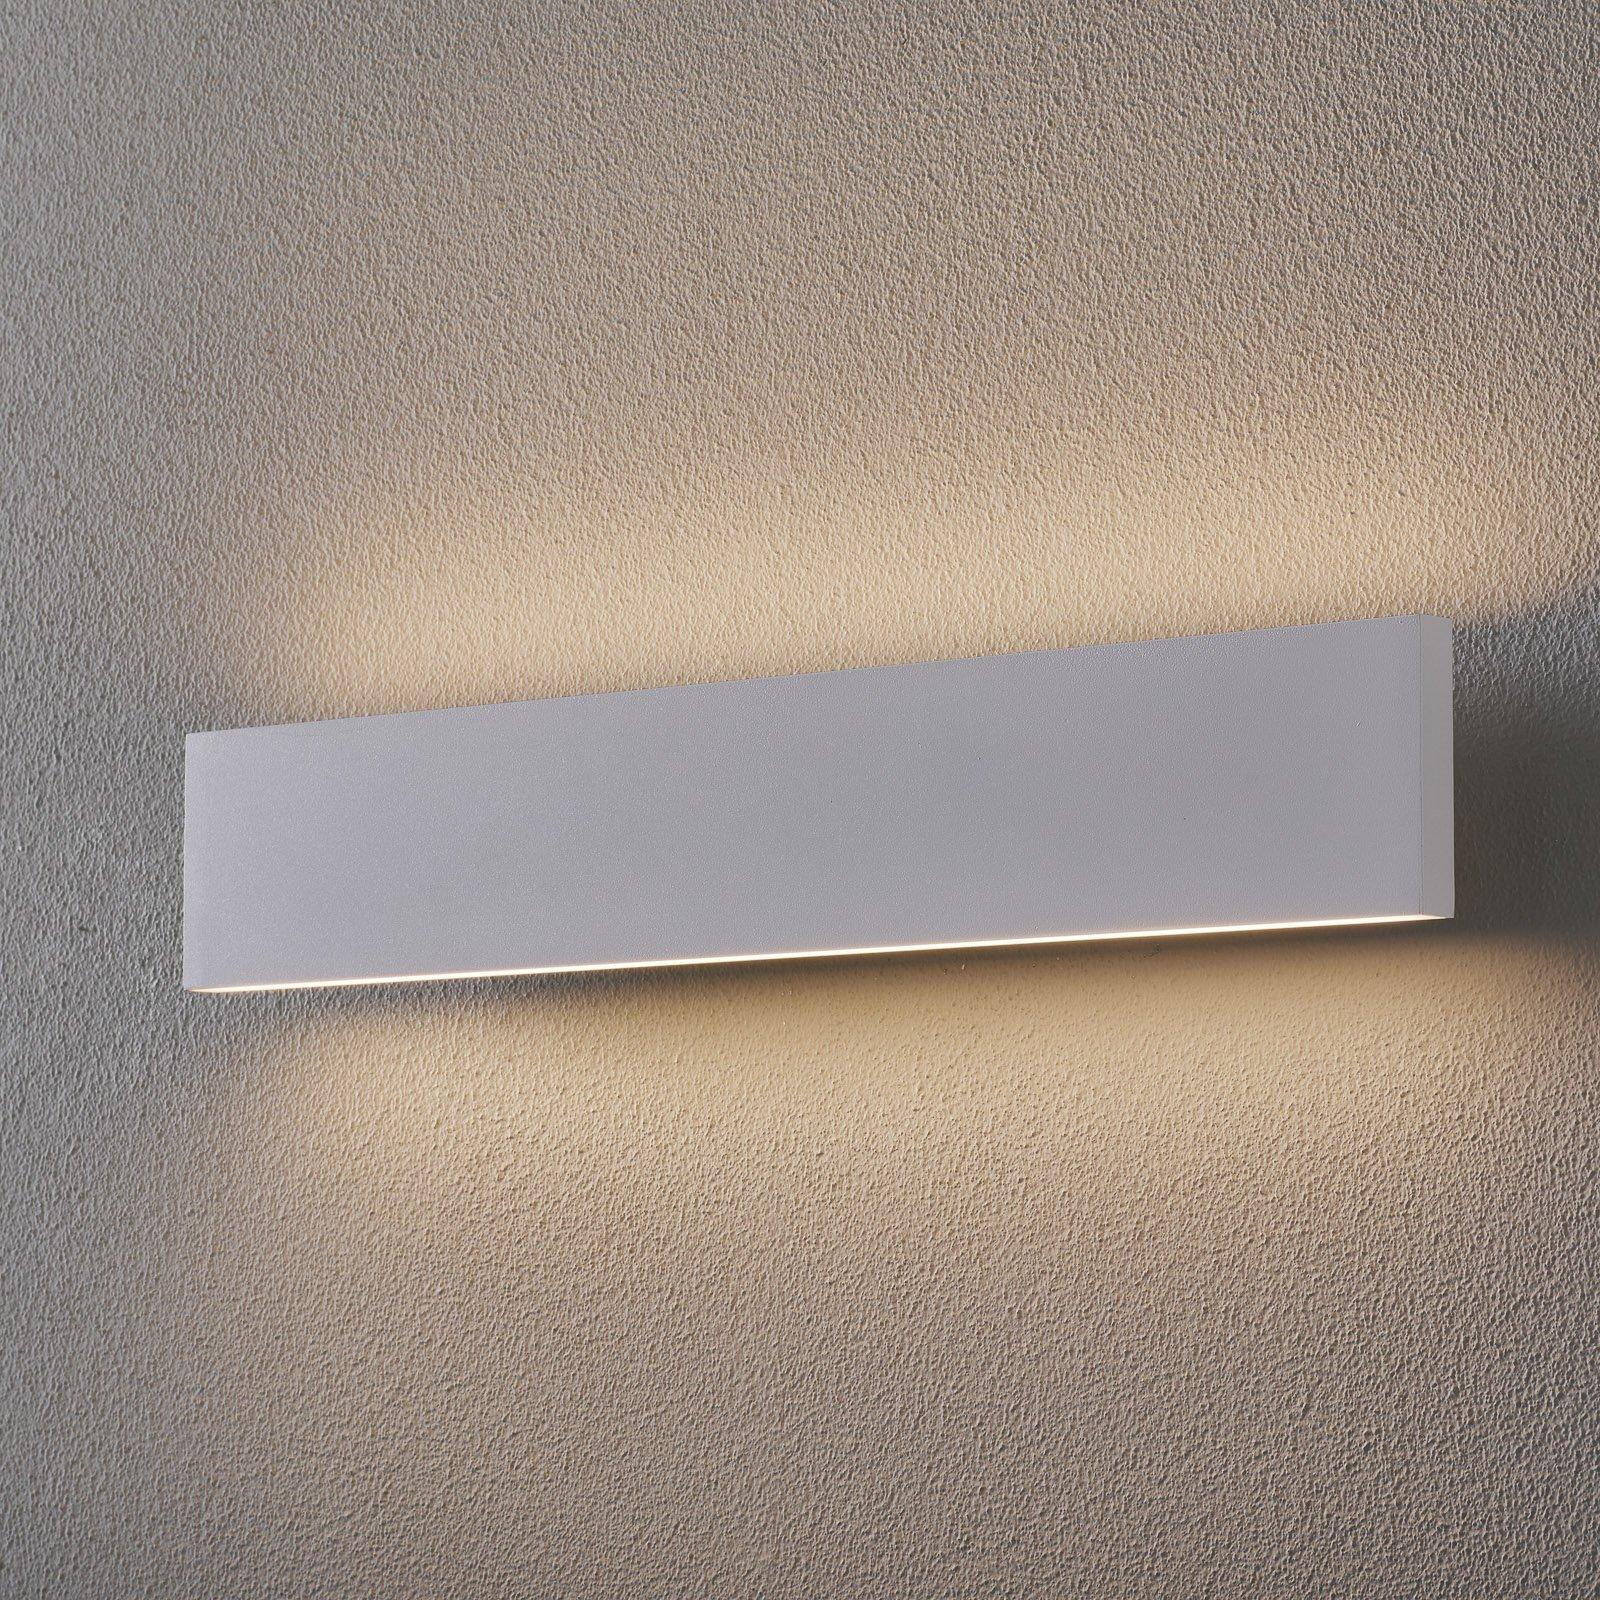 LED-vegglampe Concha 47 cm, hvit